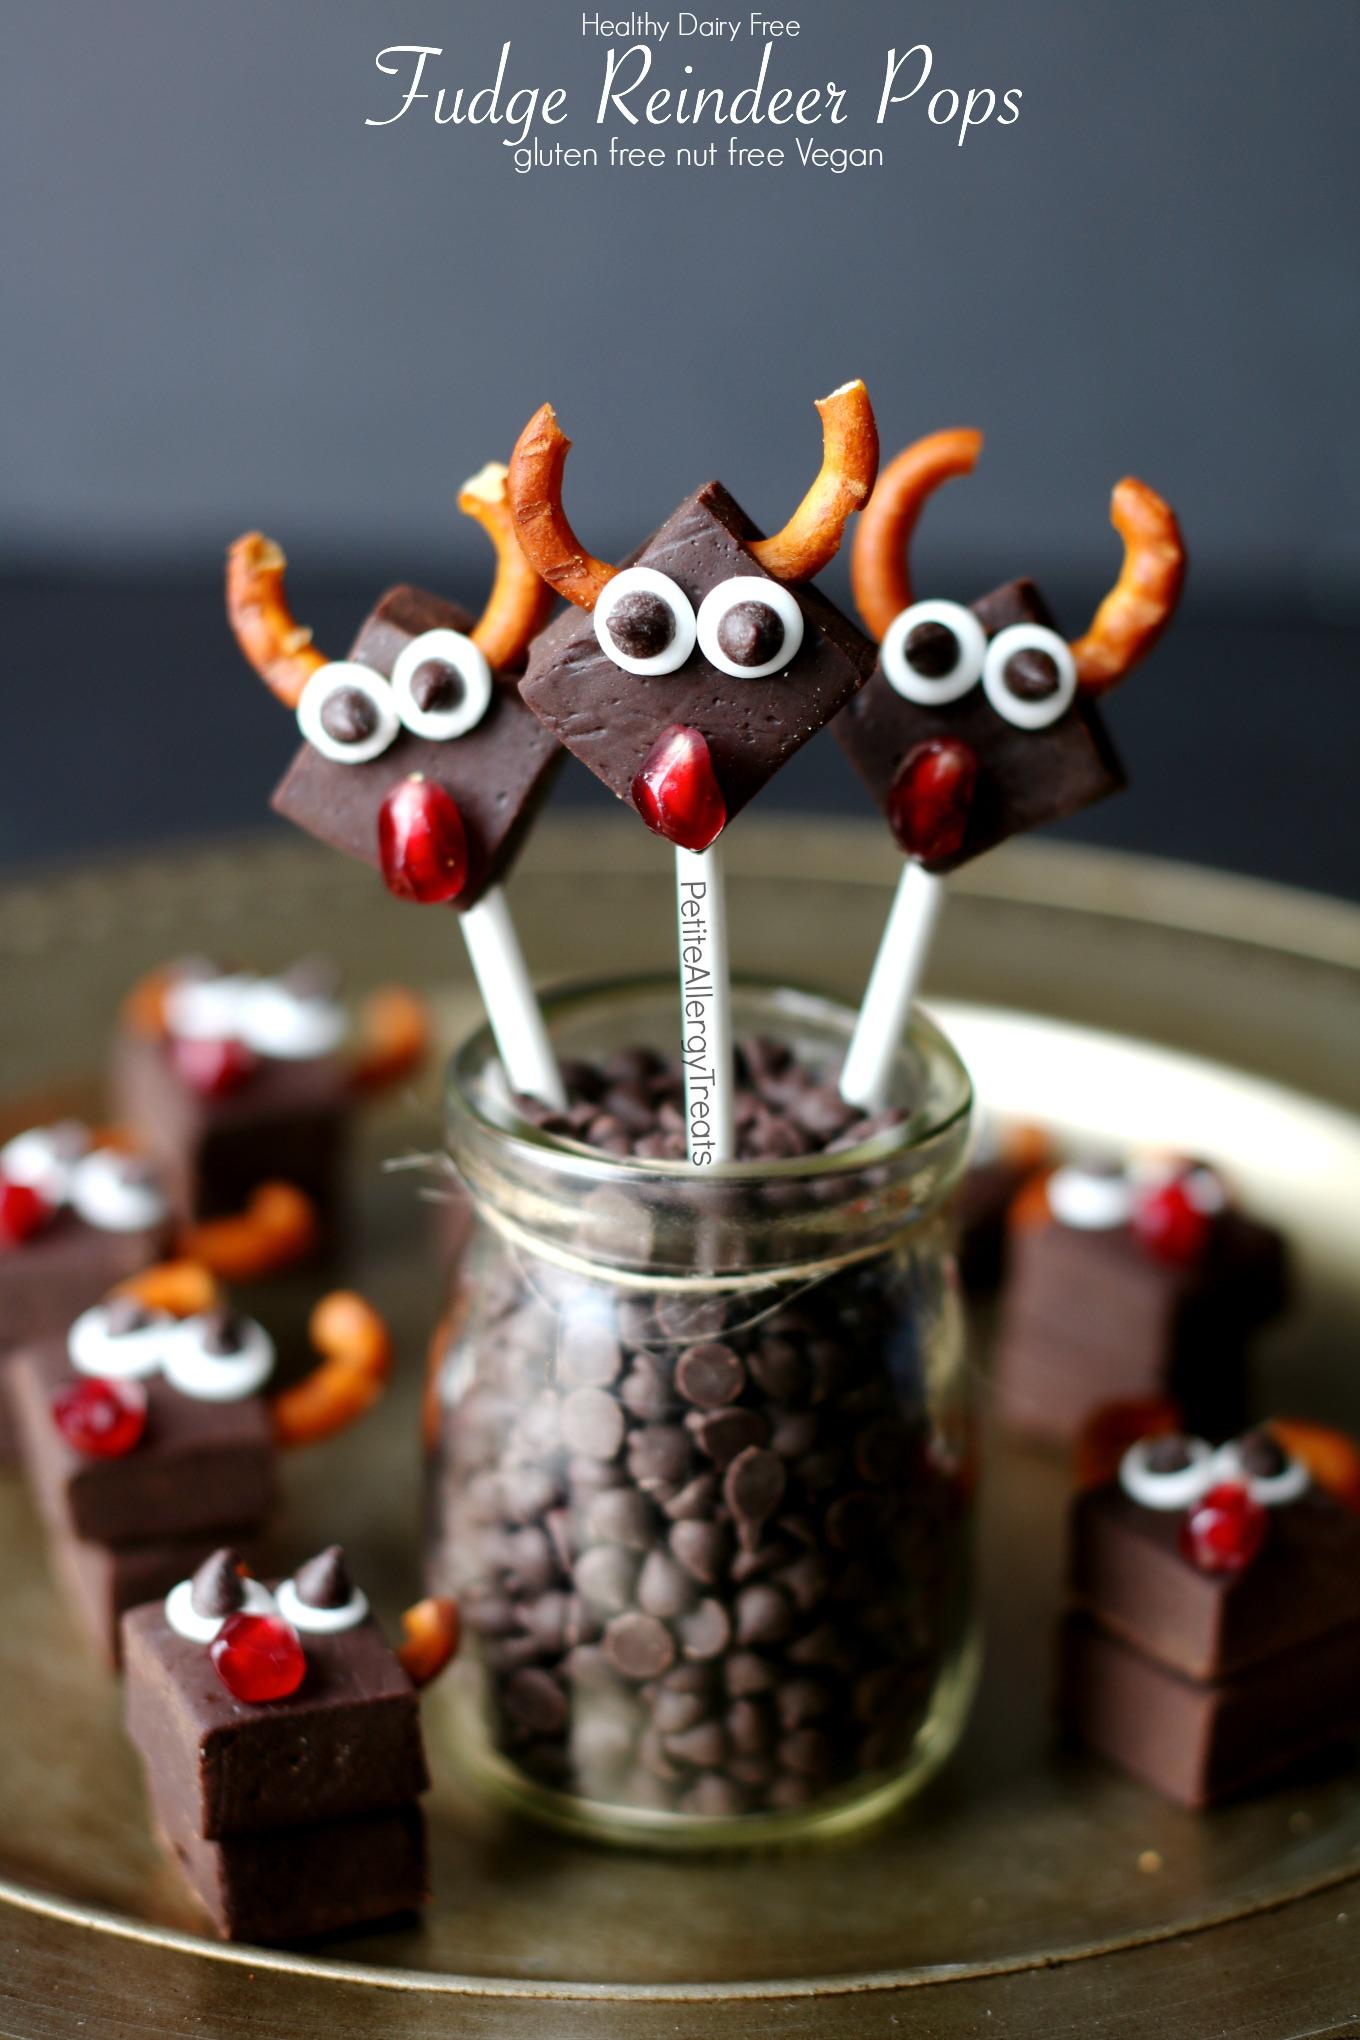 Healthy Dairy Free Fudge Reindeer Pops Recipe (vegan gluten free)- No Bake Adorable reindeer pops for Christmas! Dye free gluten free and food allergy friendly